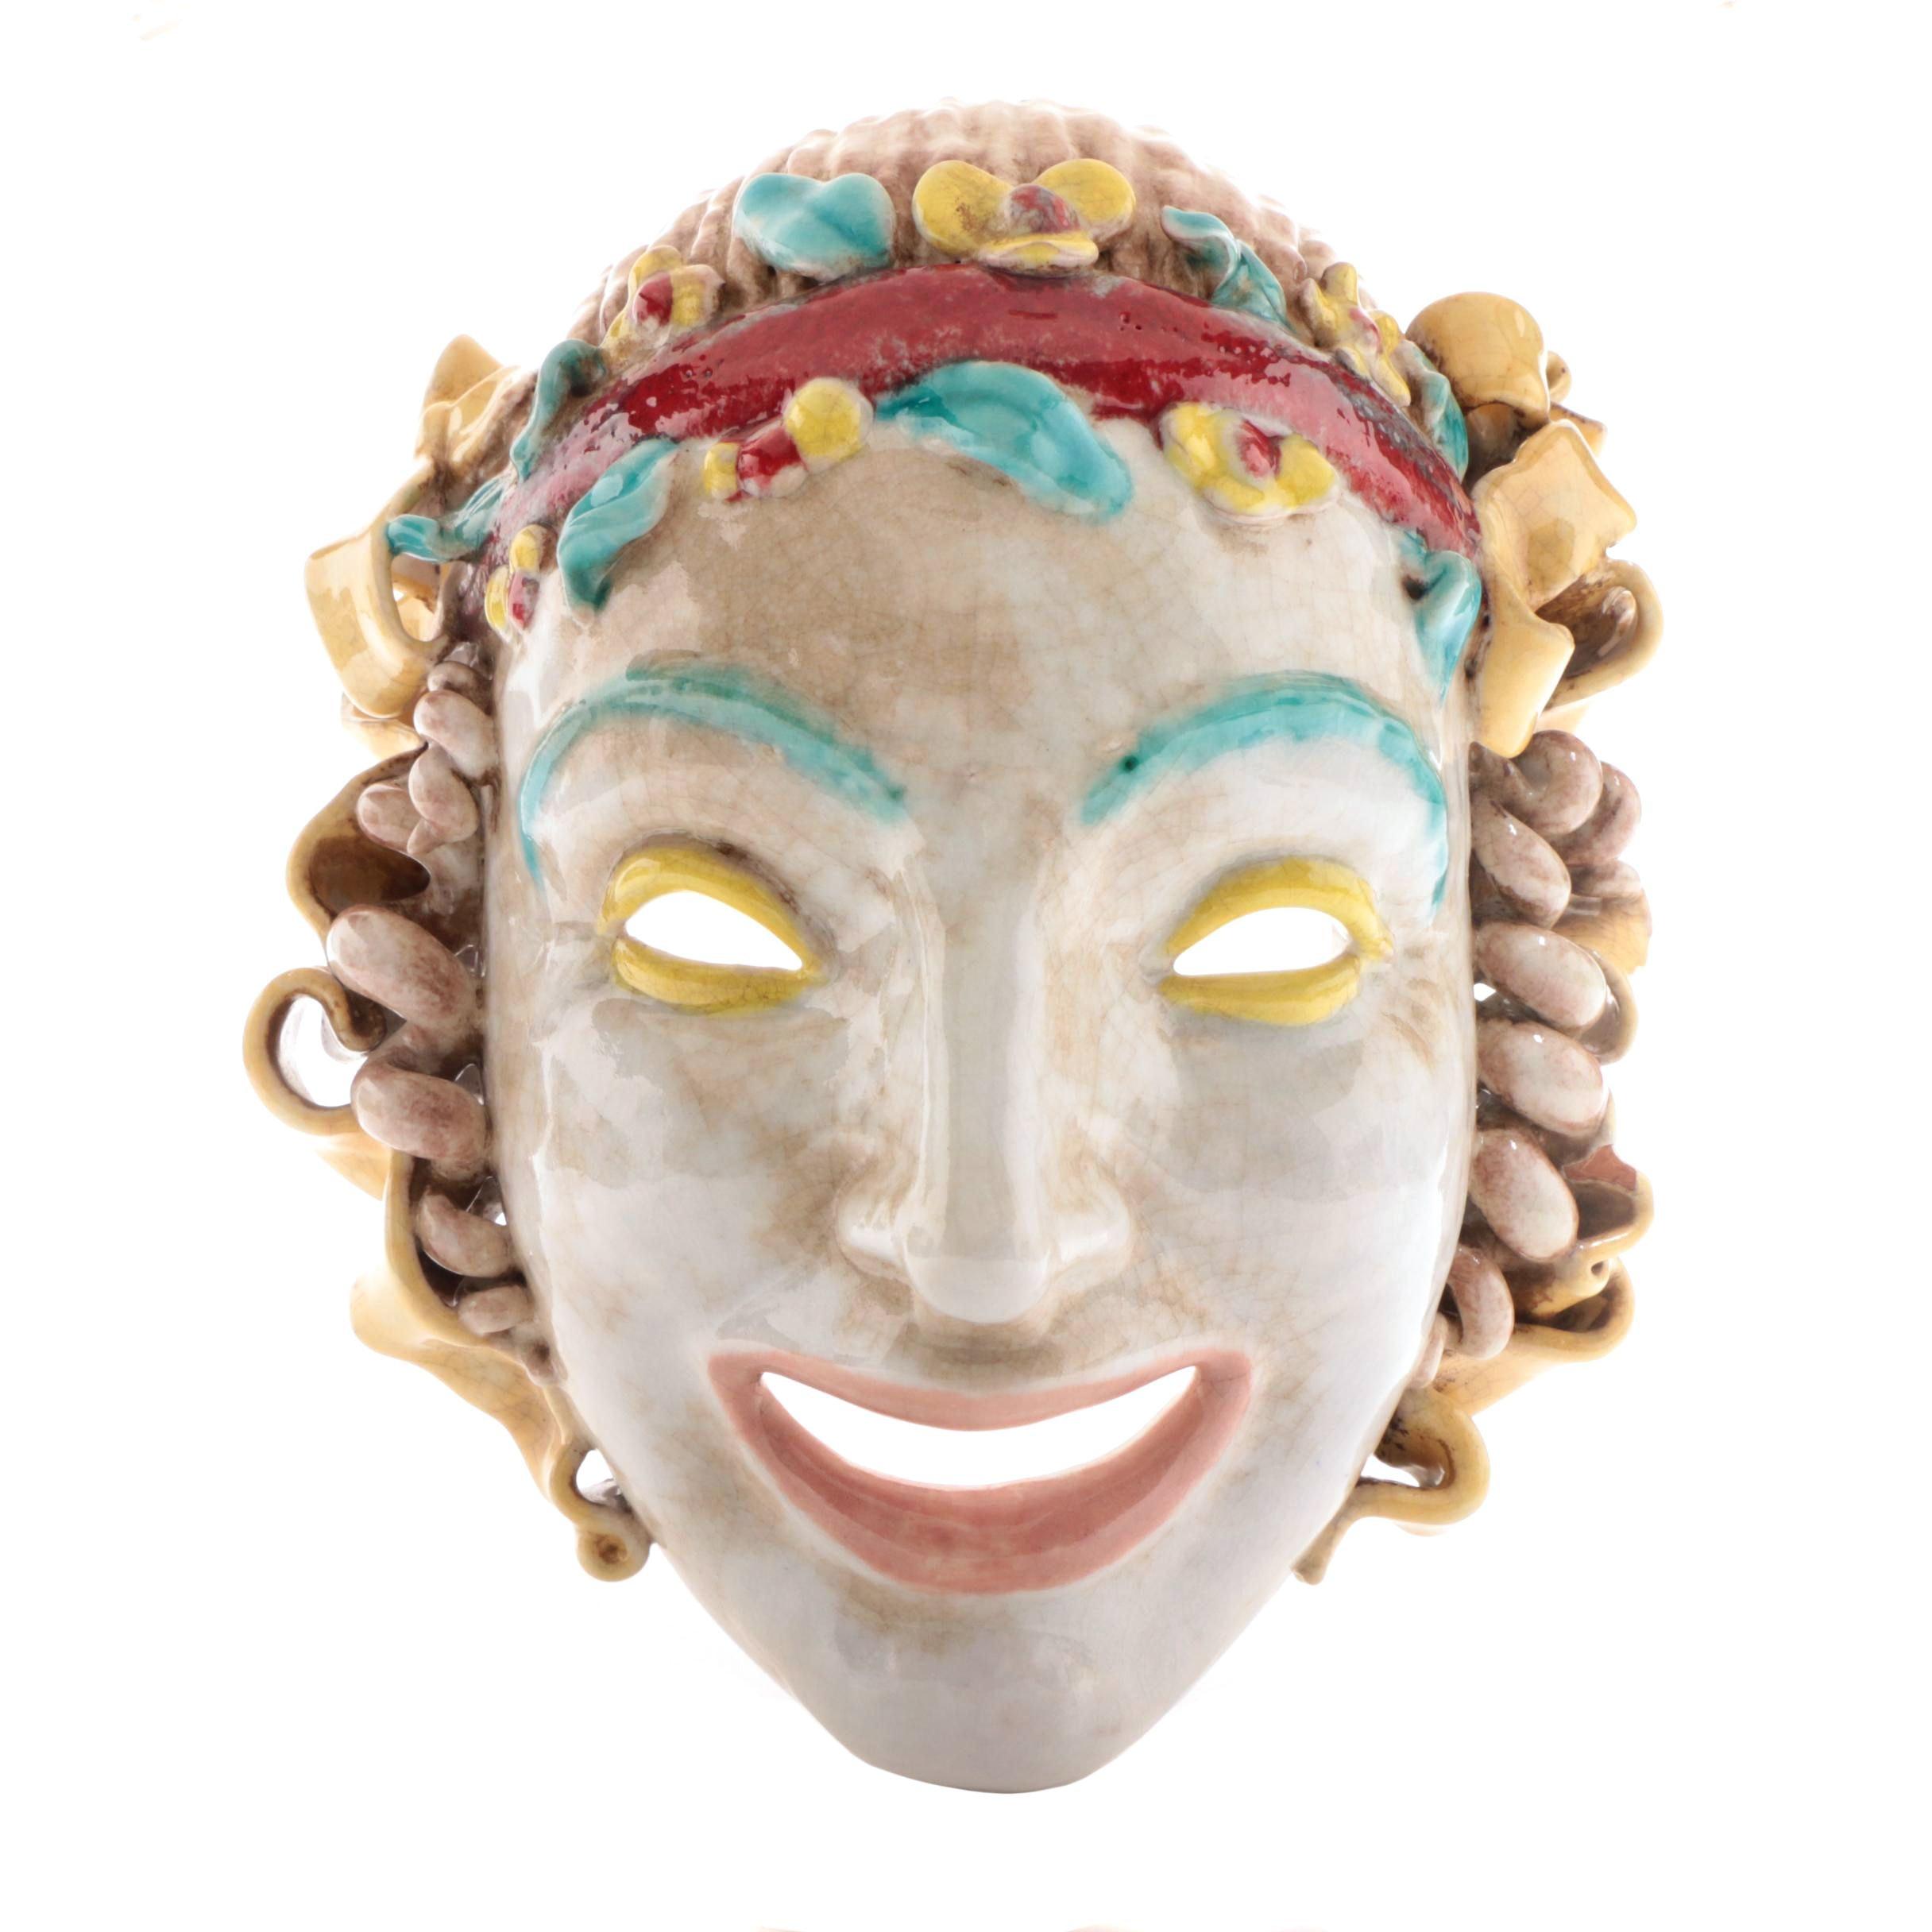 Eugenio Pattarino Ceramic Mask